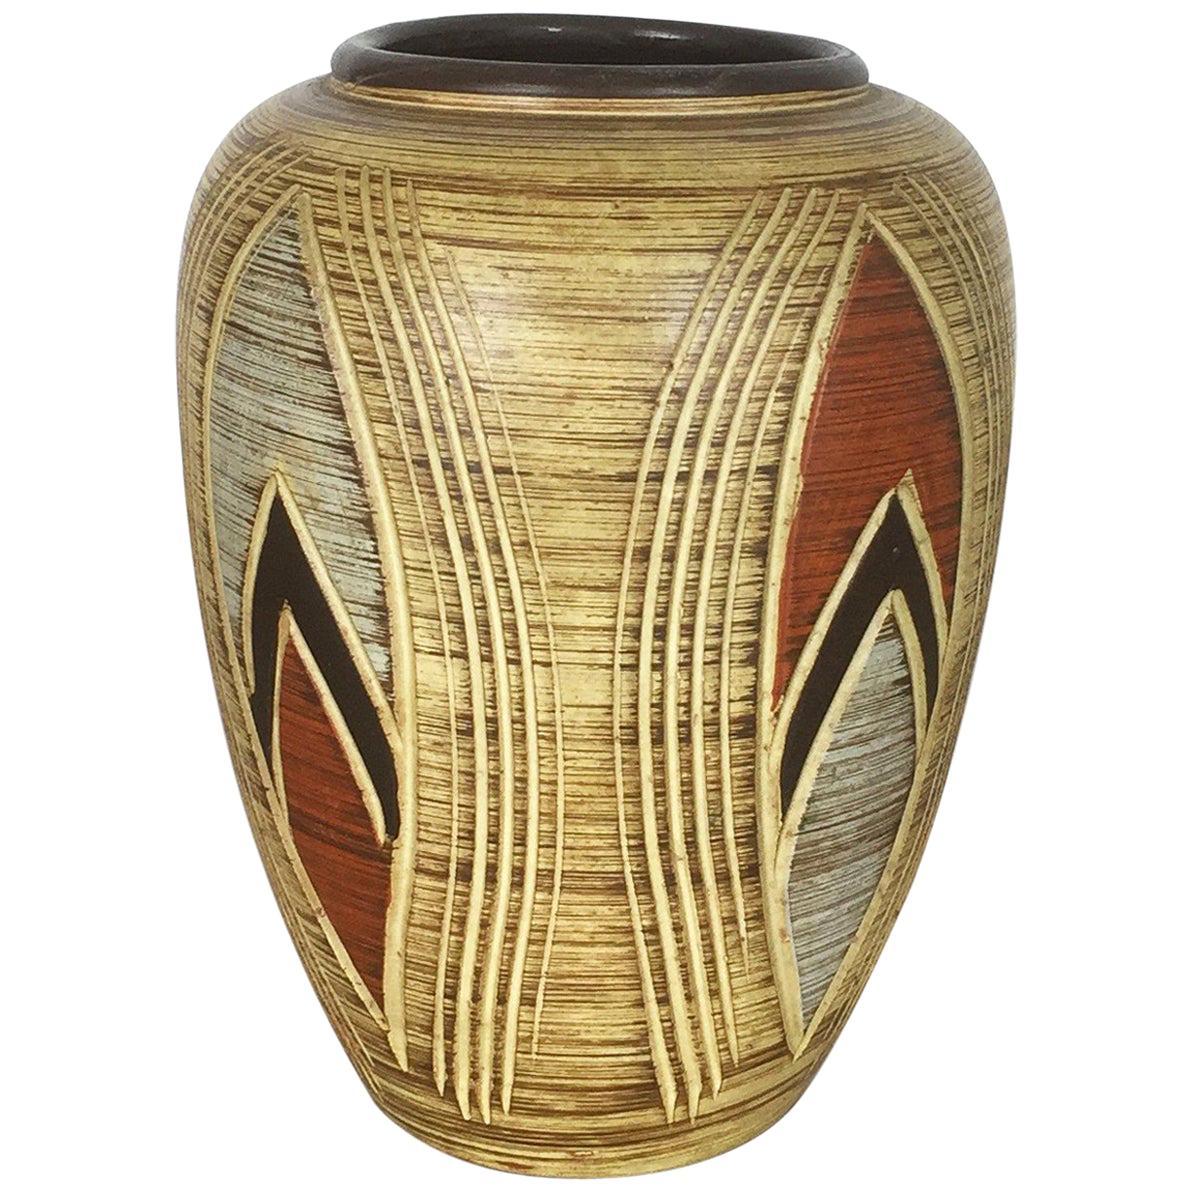 Vintage 1960s Ceramic Pottery Vase by Sawa Ceramic Franz Schwaderlapp, Germany